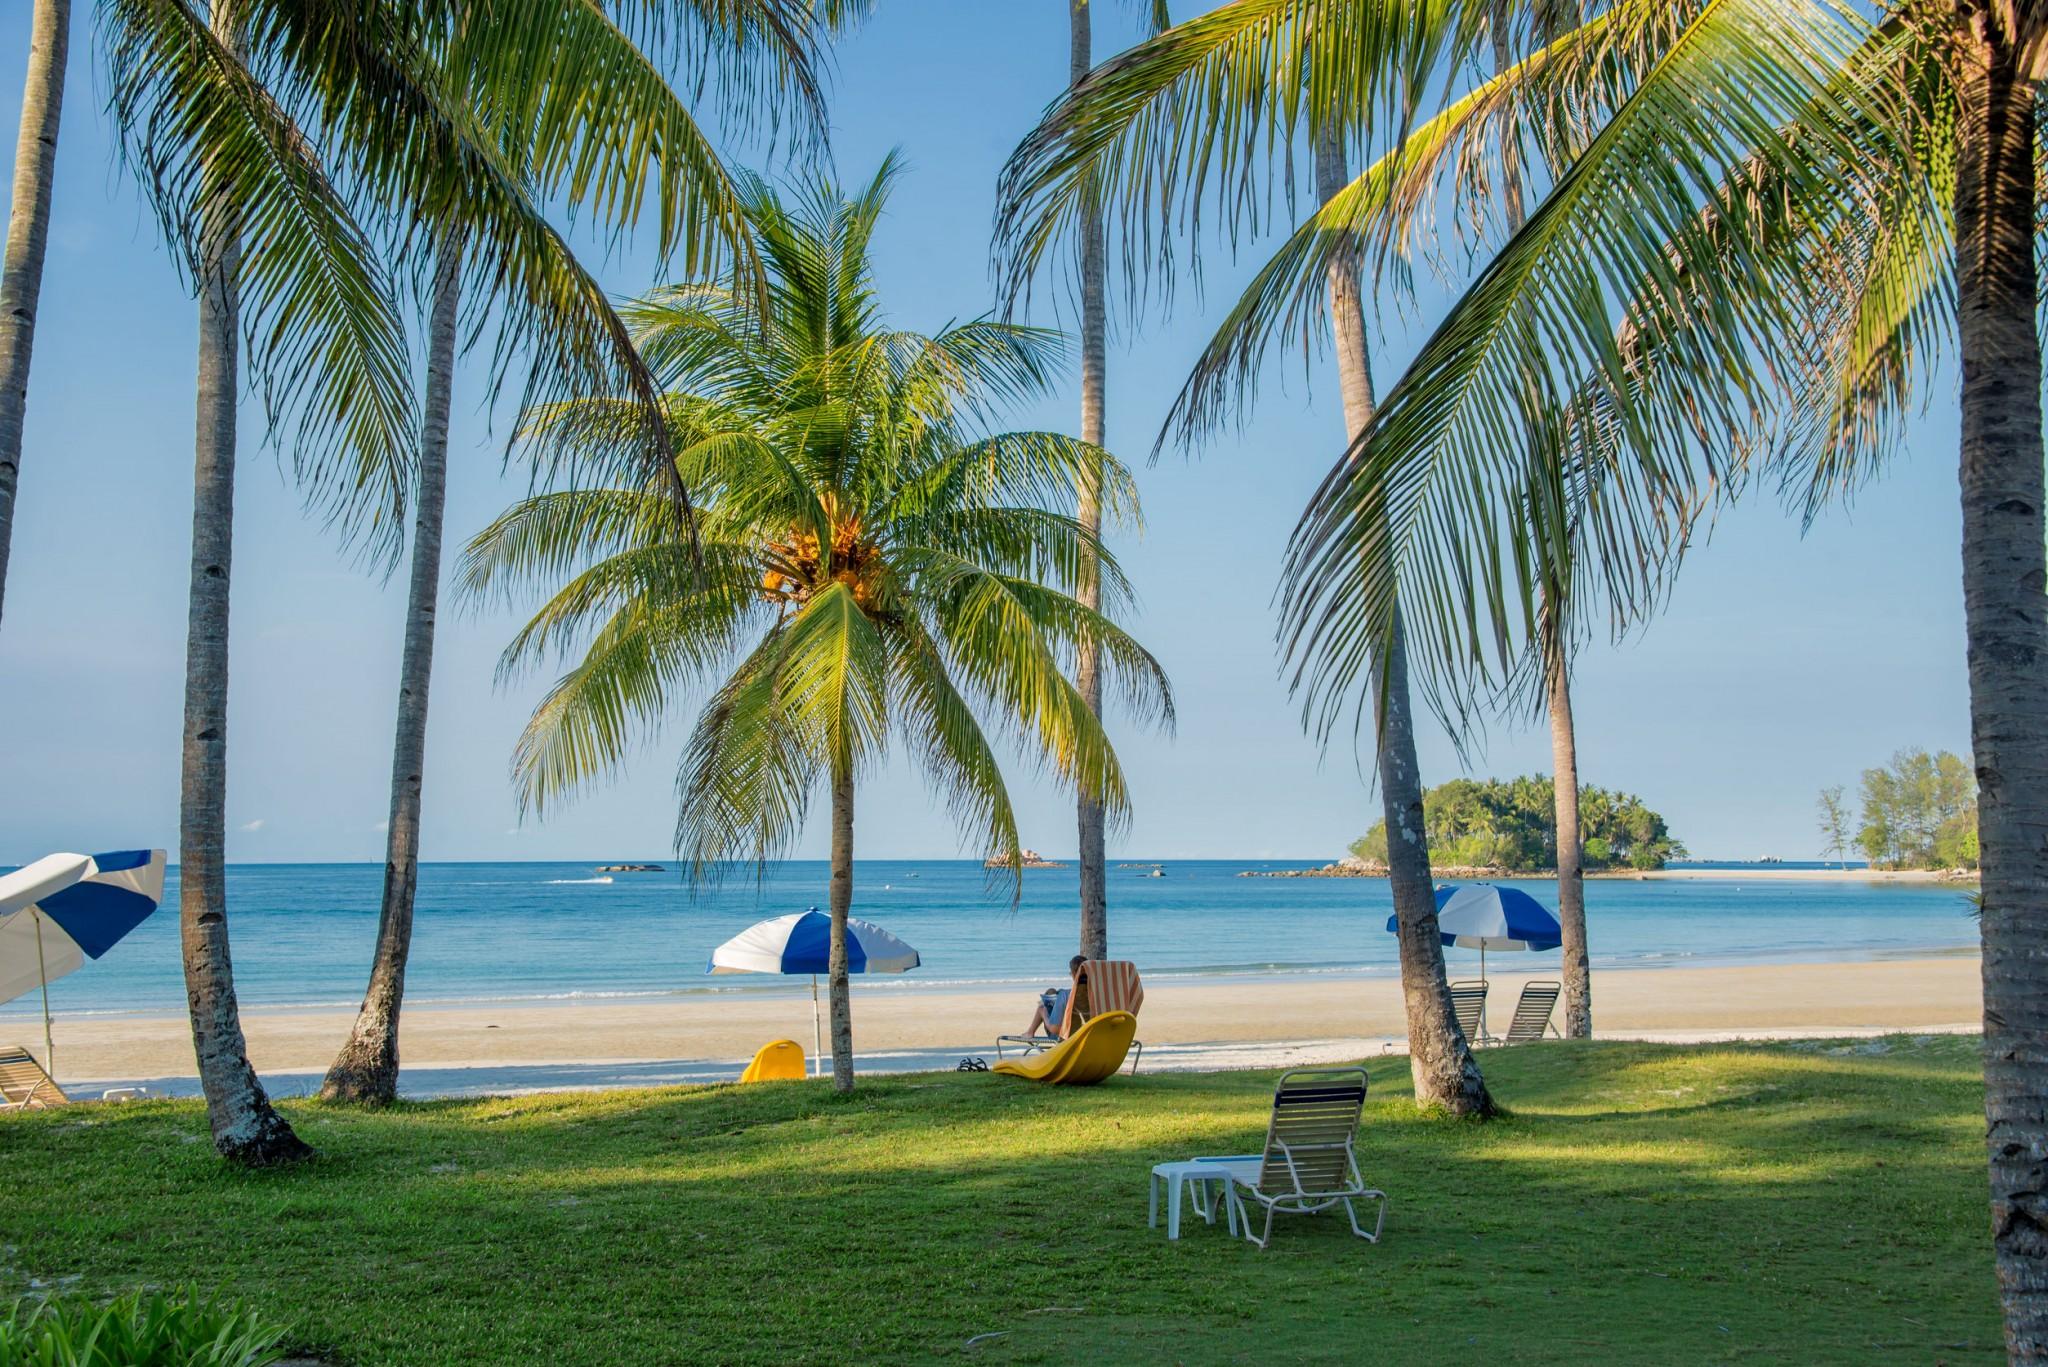 Bintan Tropical beach landscape with palm trees